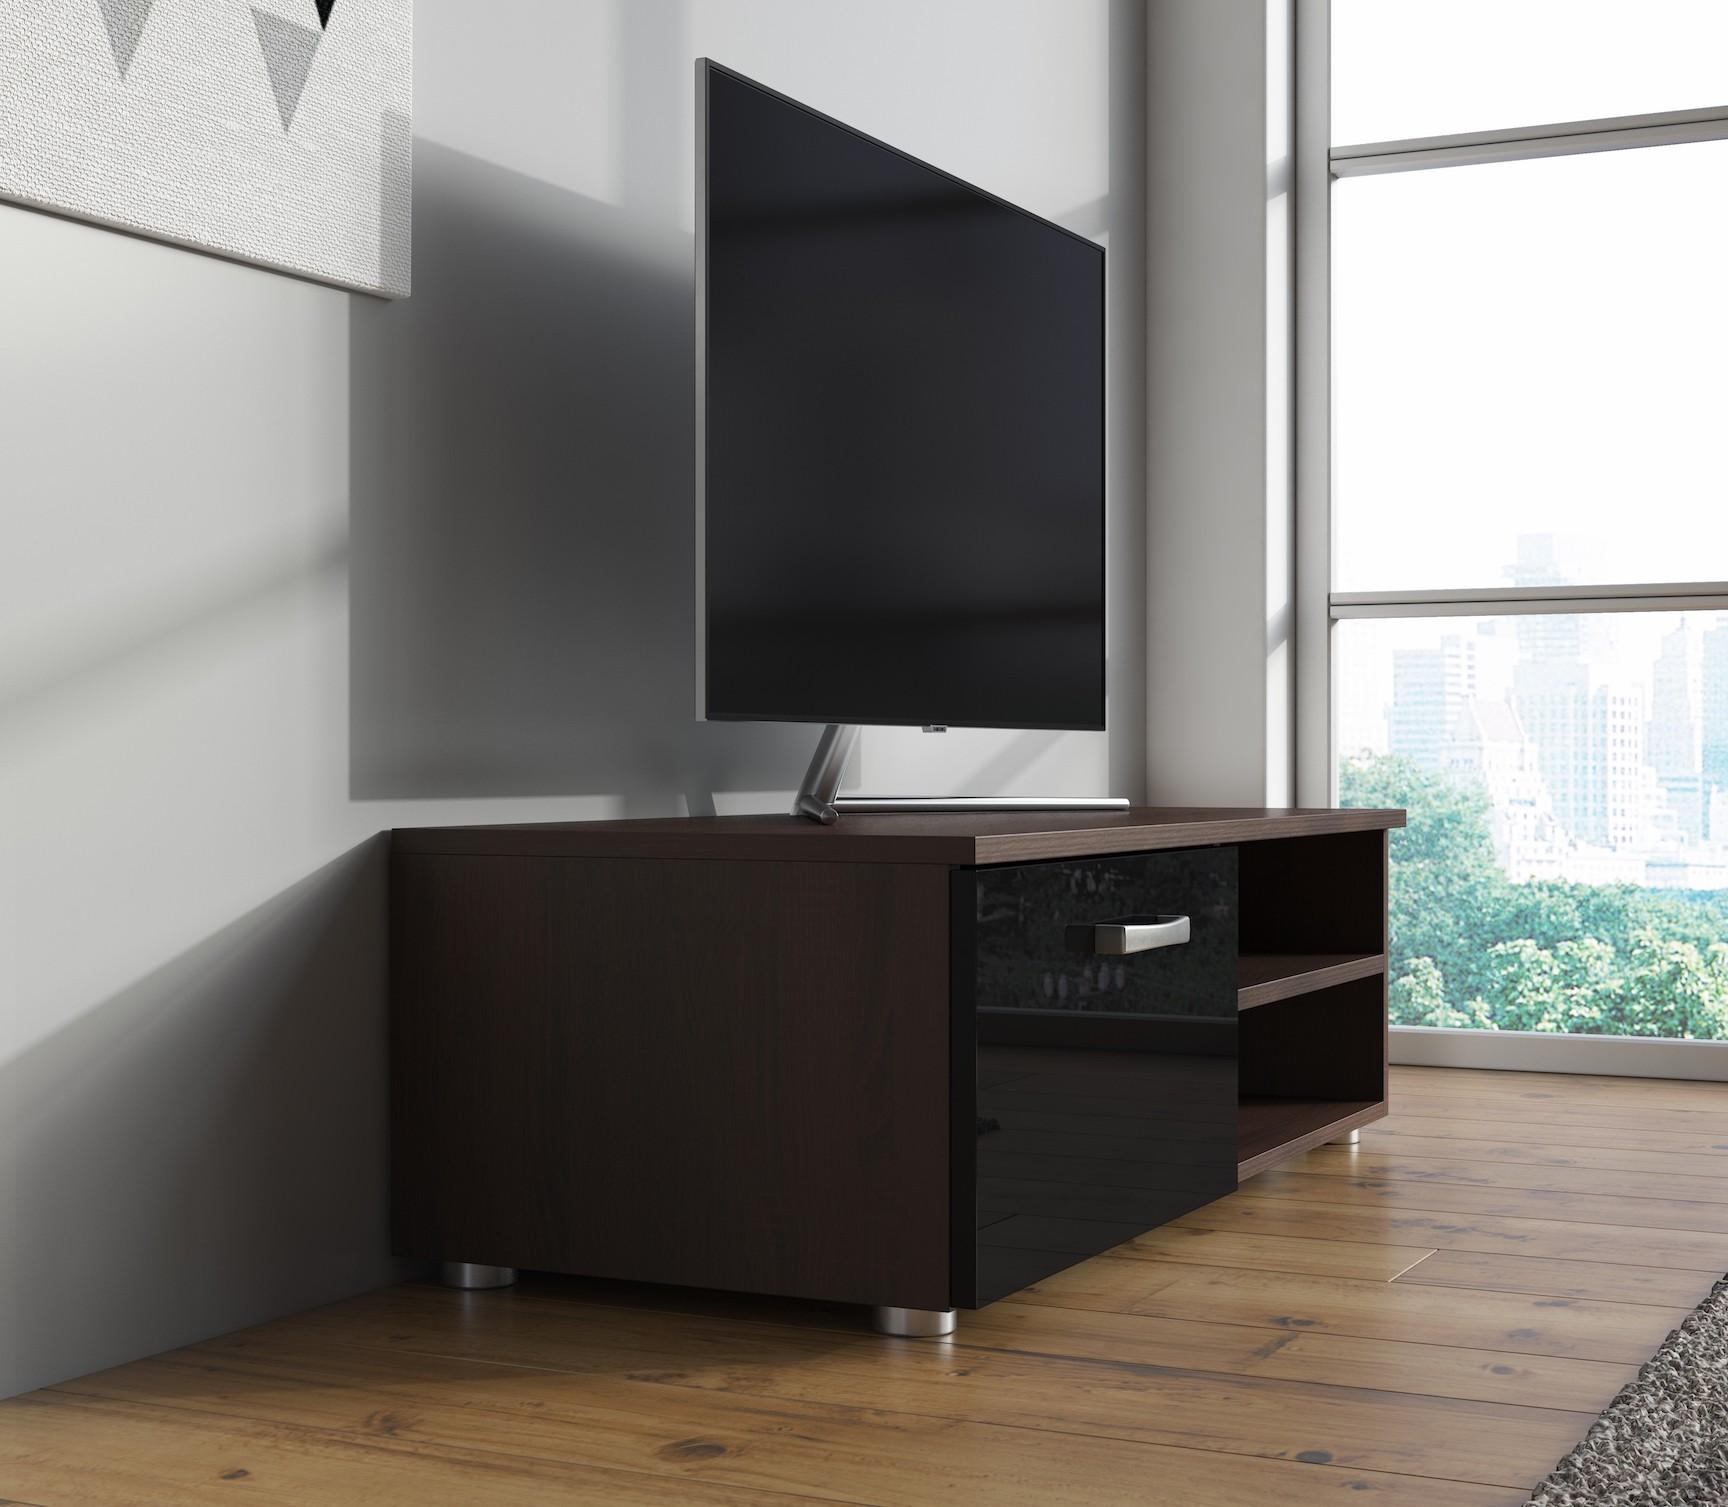 Tv meubel memphis klein zwart donker eiken 96 cm for Showroommodellen design meubels